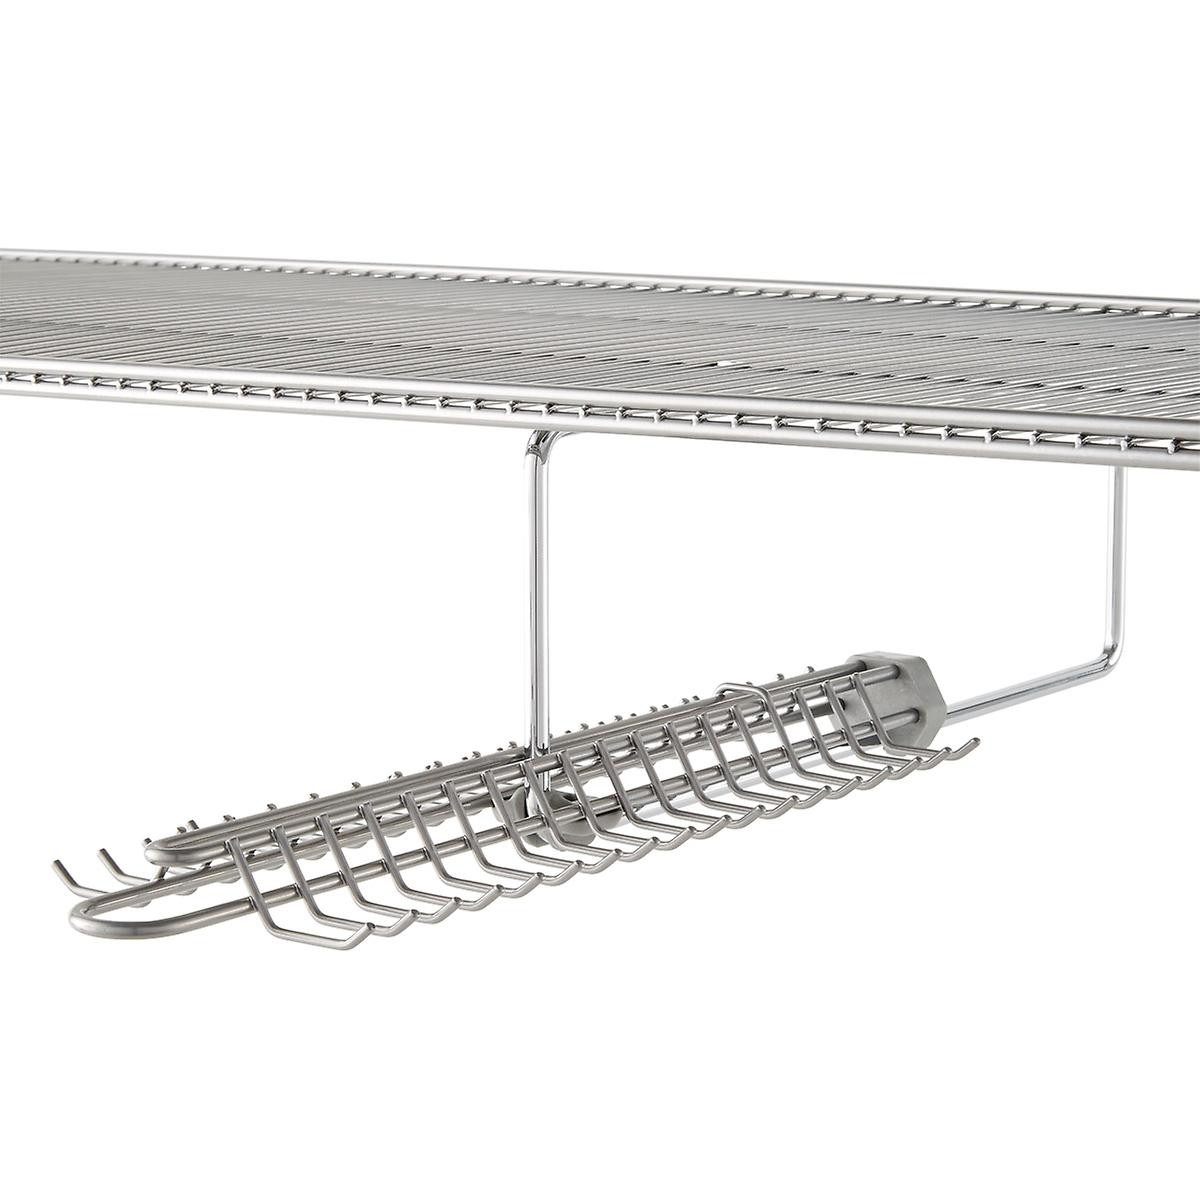 tie rack elfa gliding tie belt rack the container store. Black Bedroom Furniture Sets. Home Design Ideas